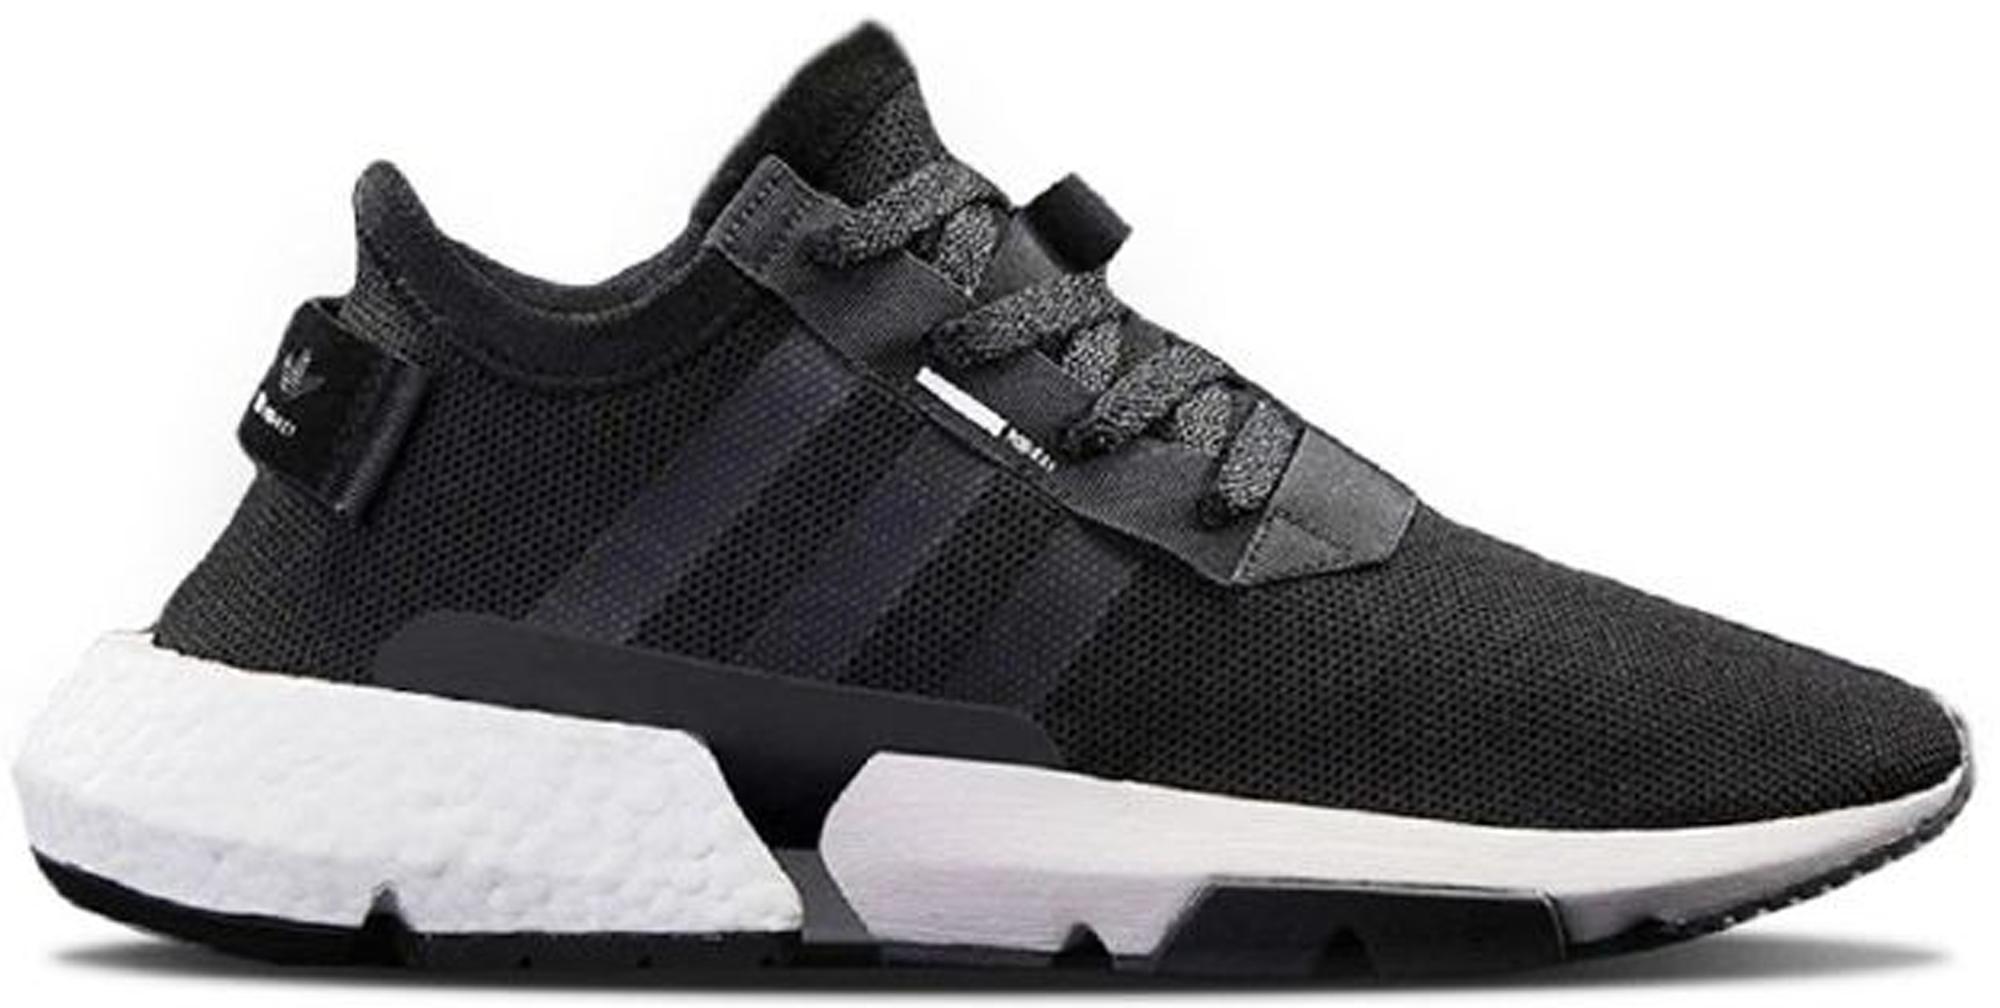 adidas POD-S3.1 Core Black Cloud White